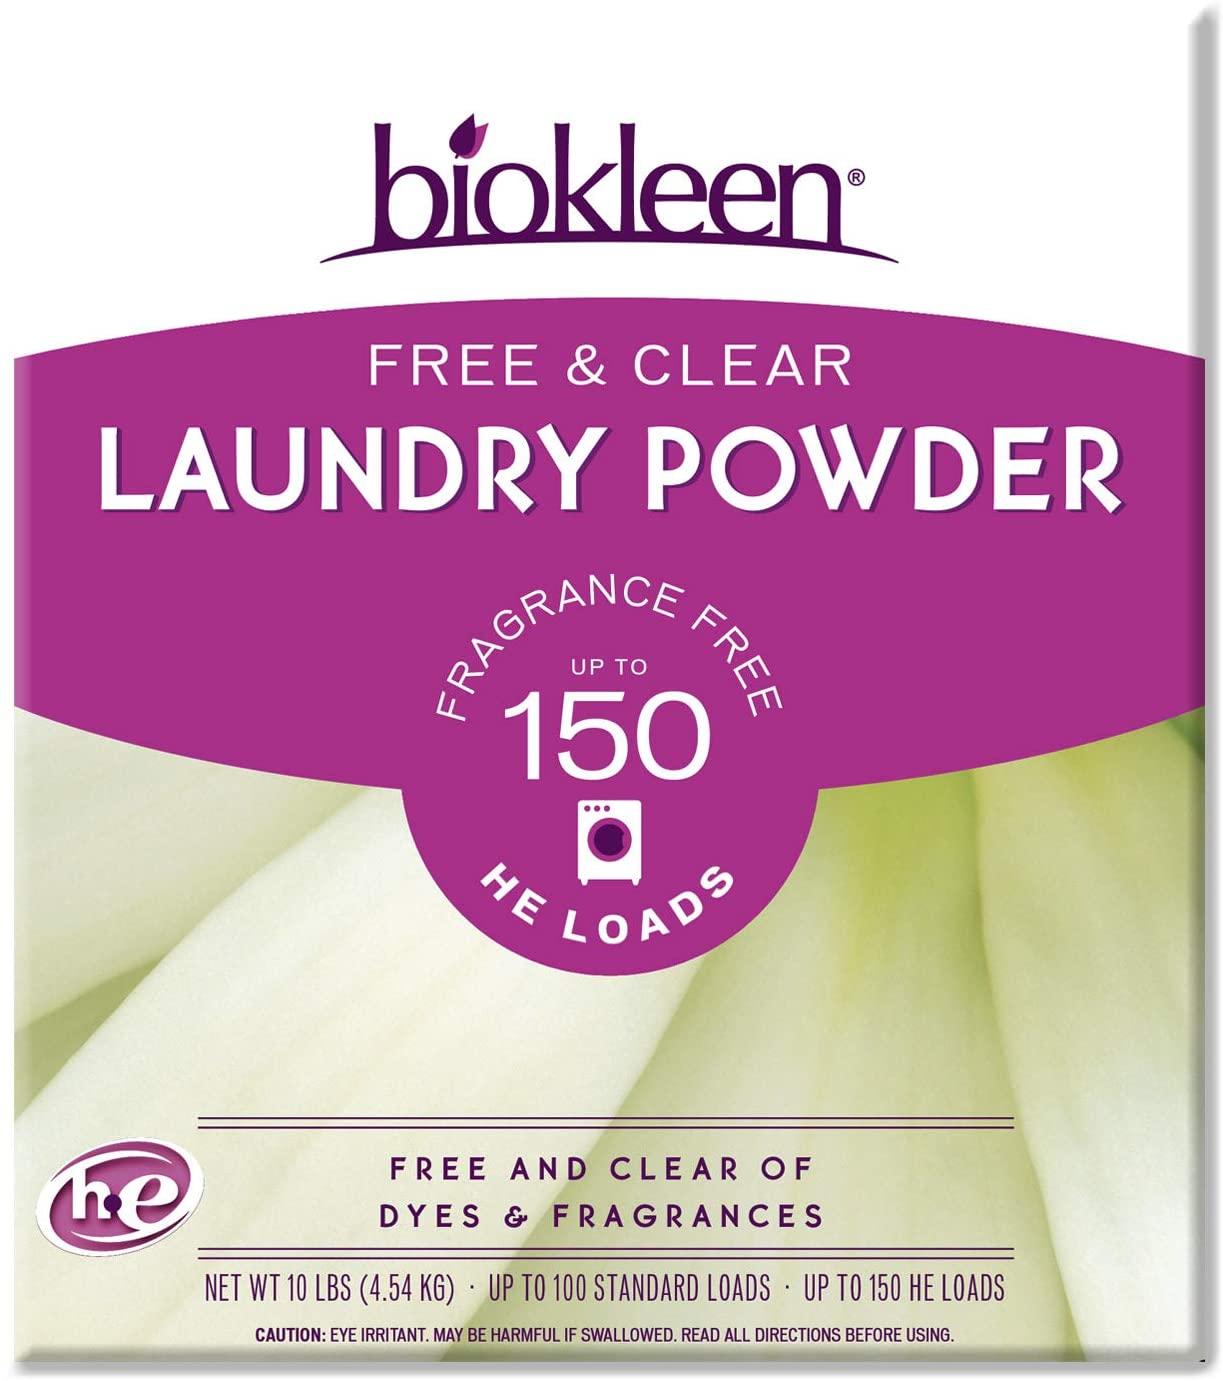 BioKleen Free & Clean Laundry Powder